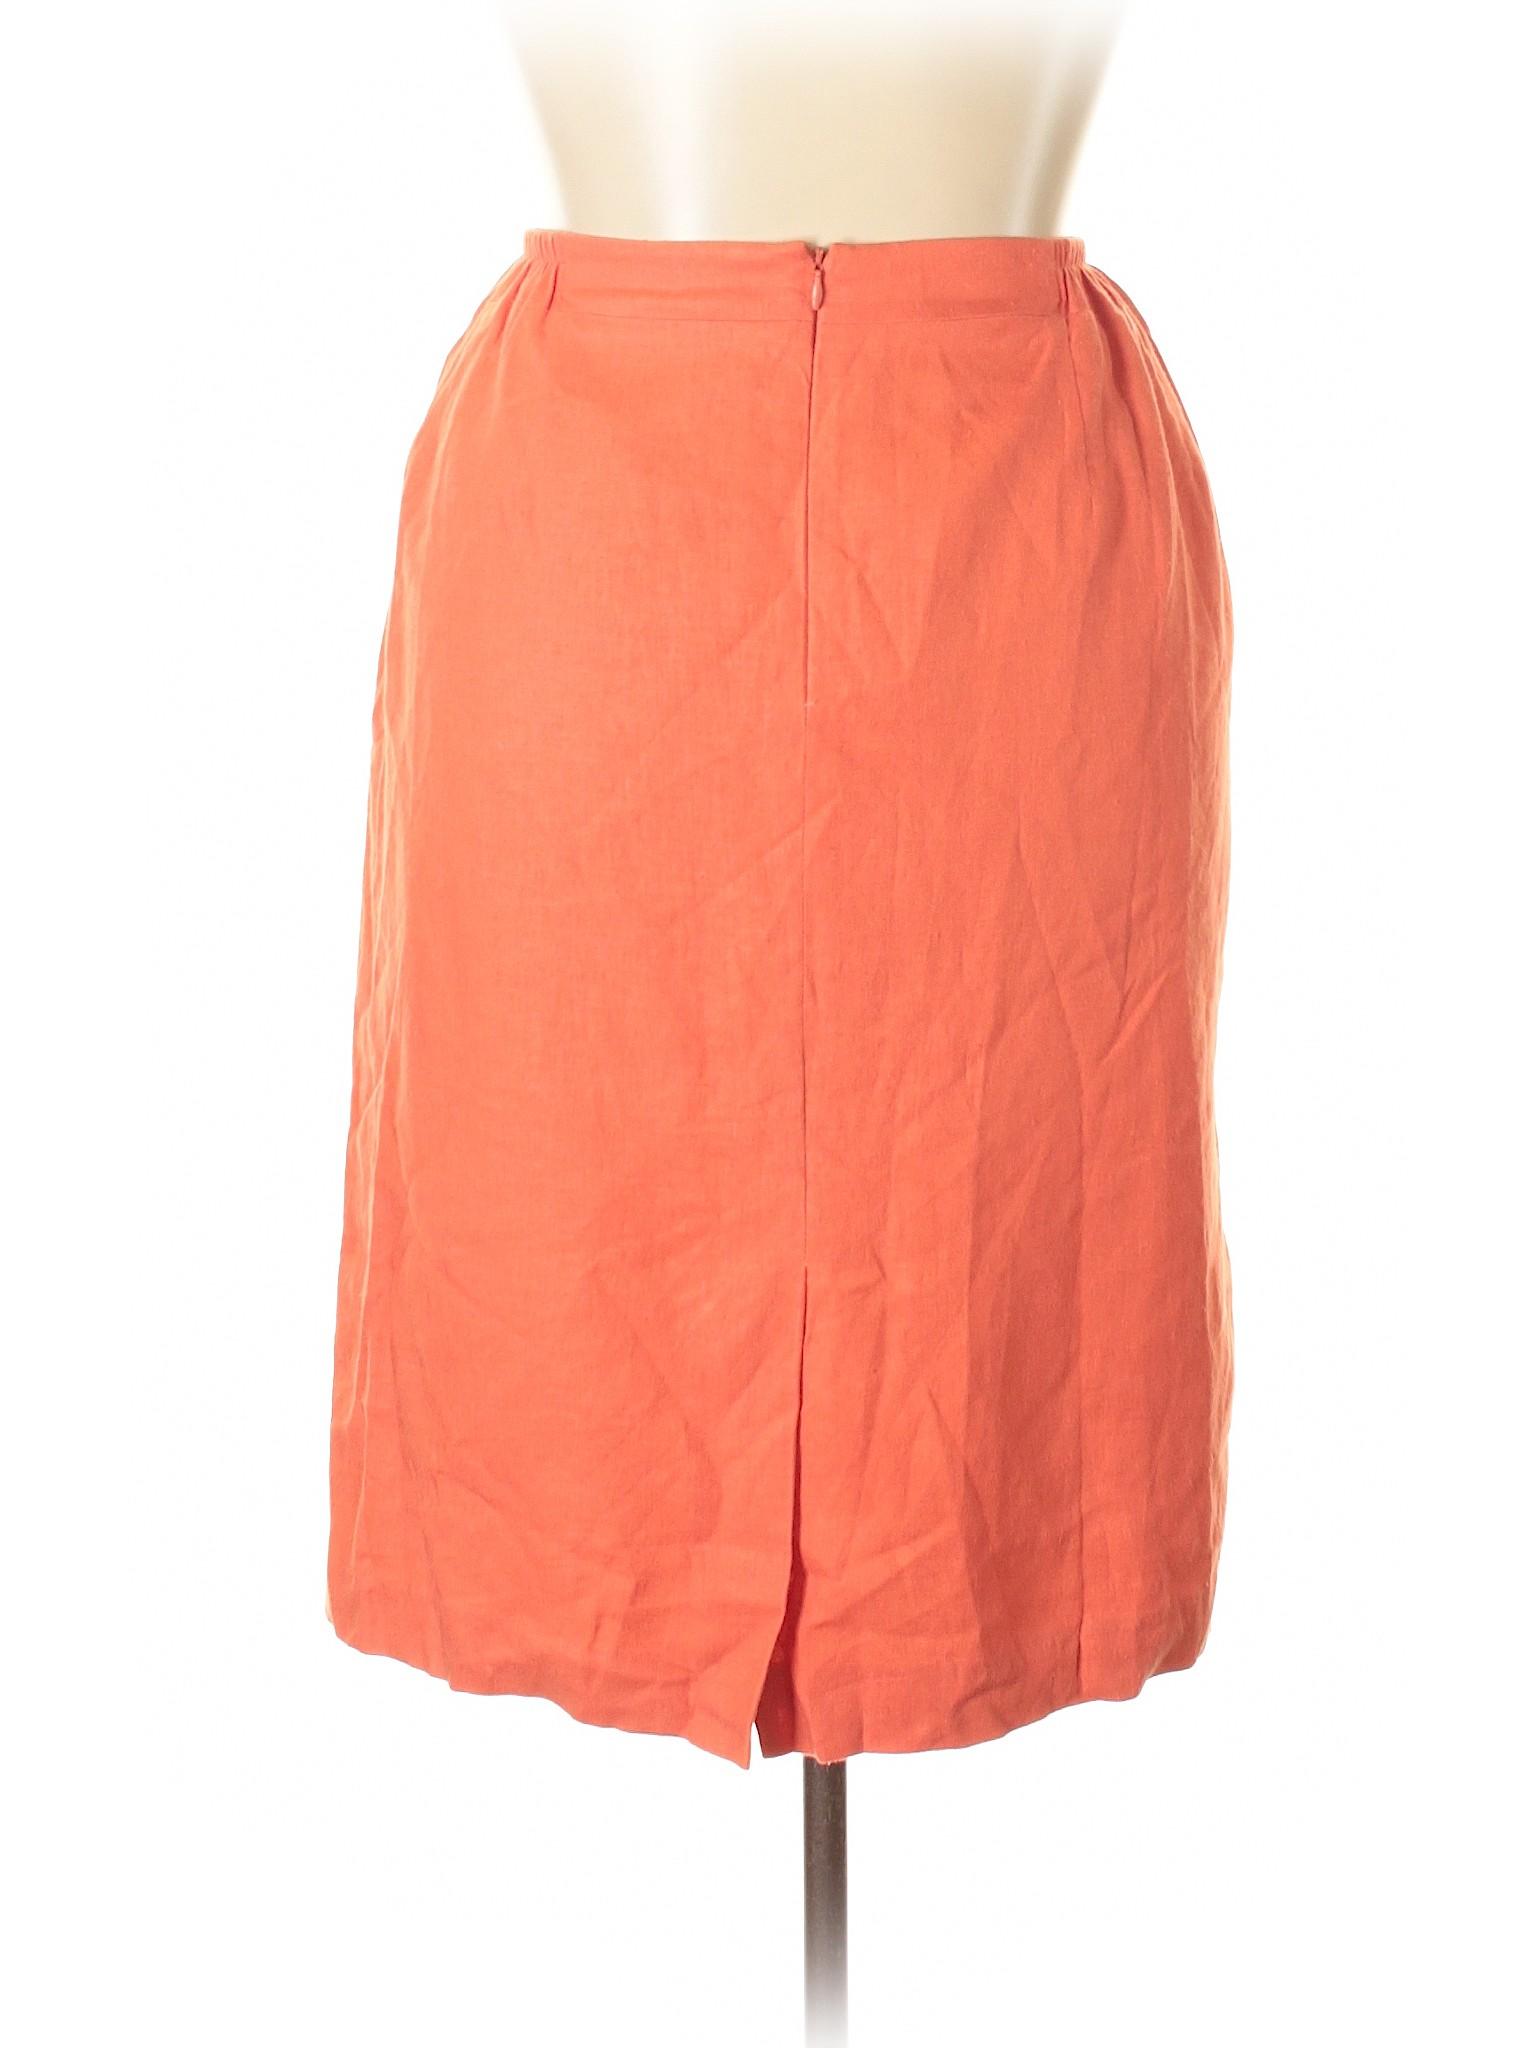 Leisure Skirt winter Leisure Casual Emily winter Emily winter Casual Skirt Leisure CtxqwvTCd